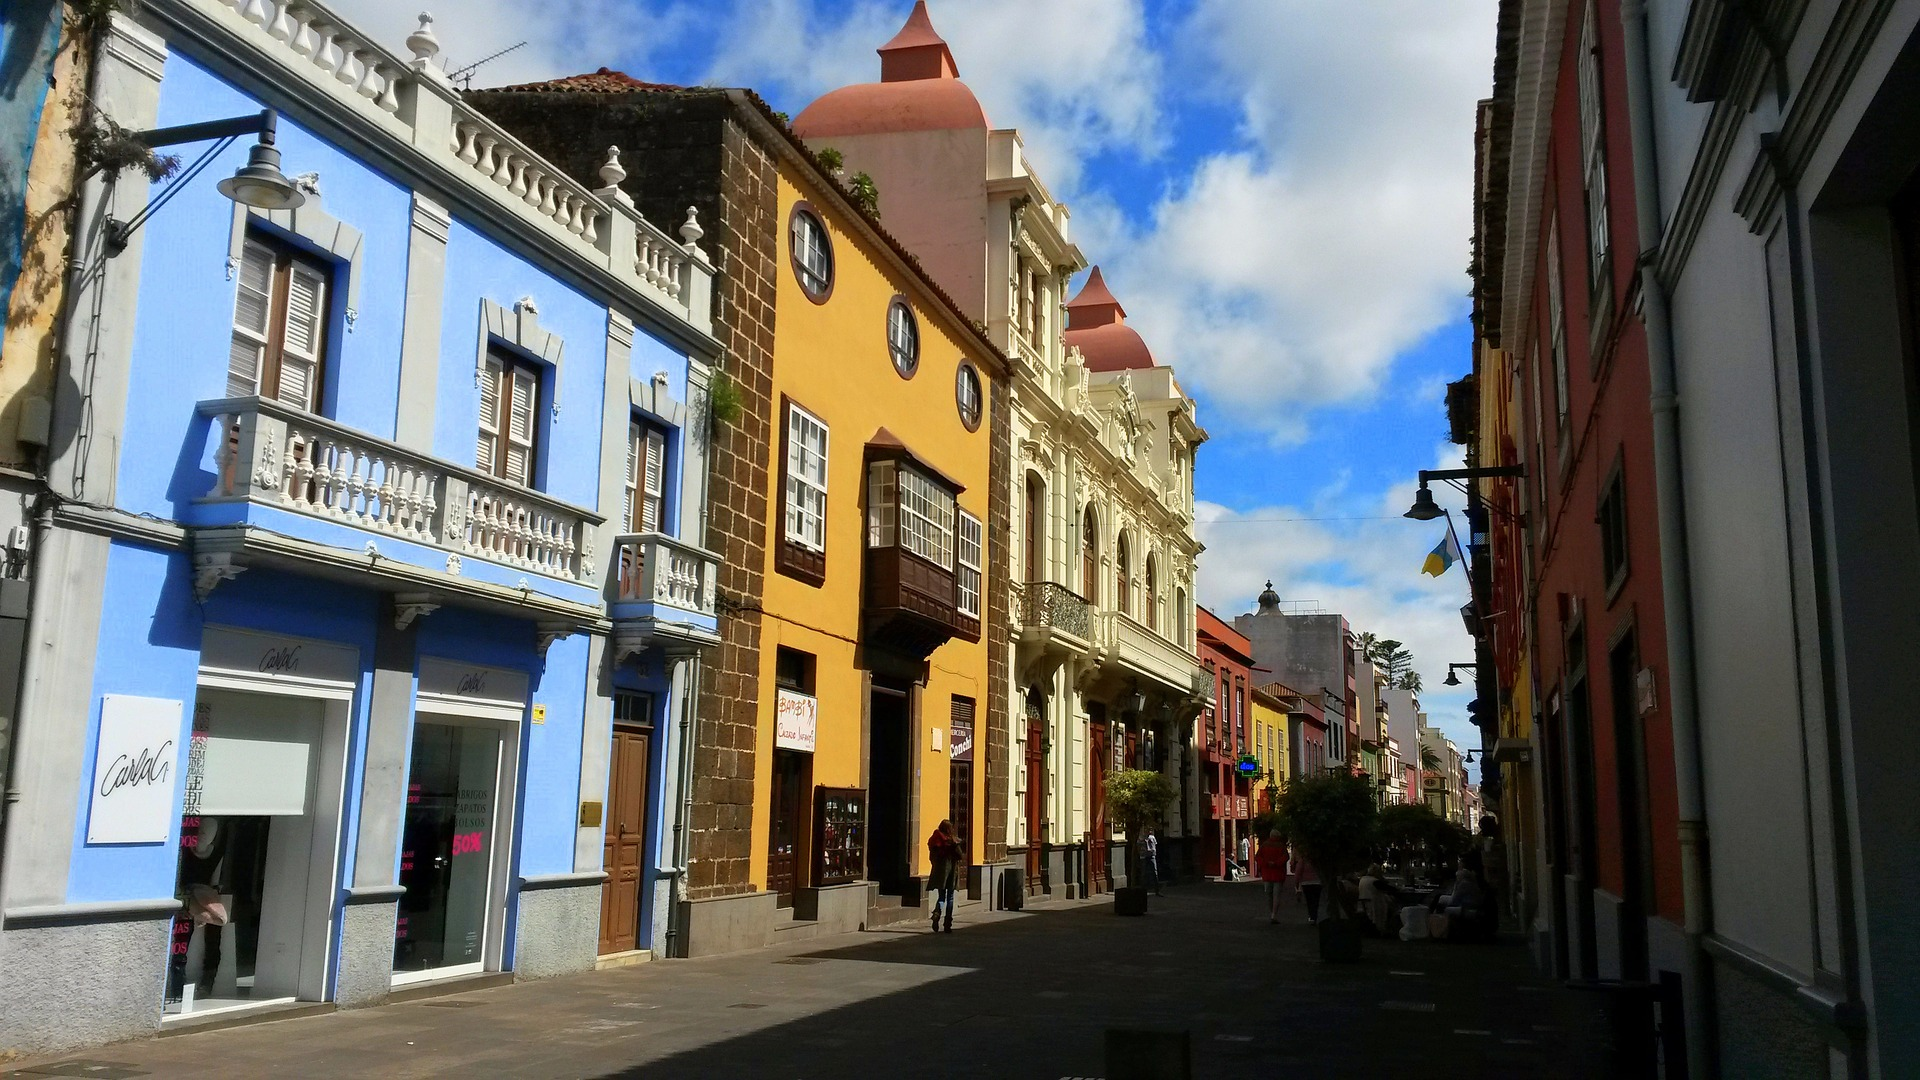 The UNESCO World Heritage Site of La Laguna.